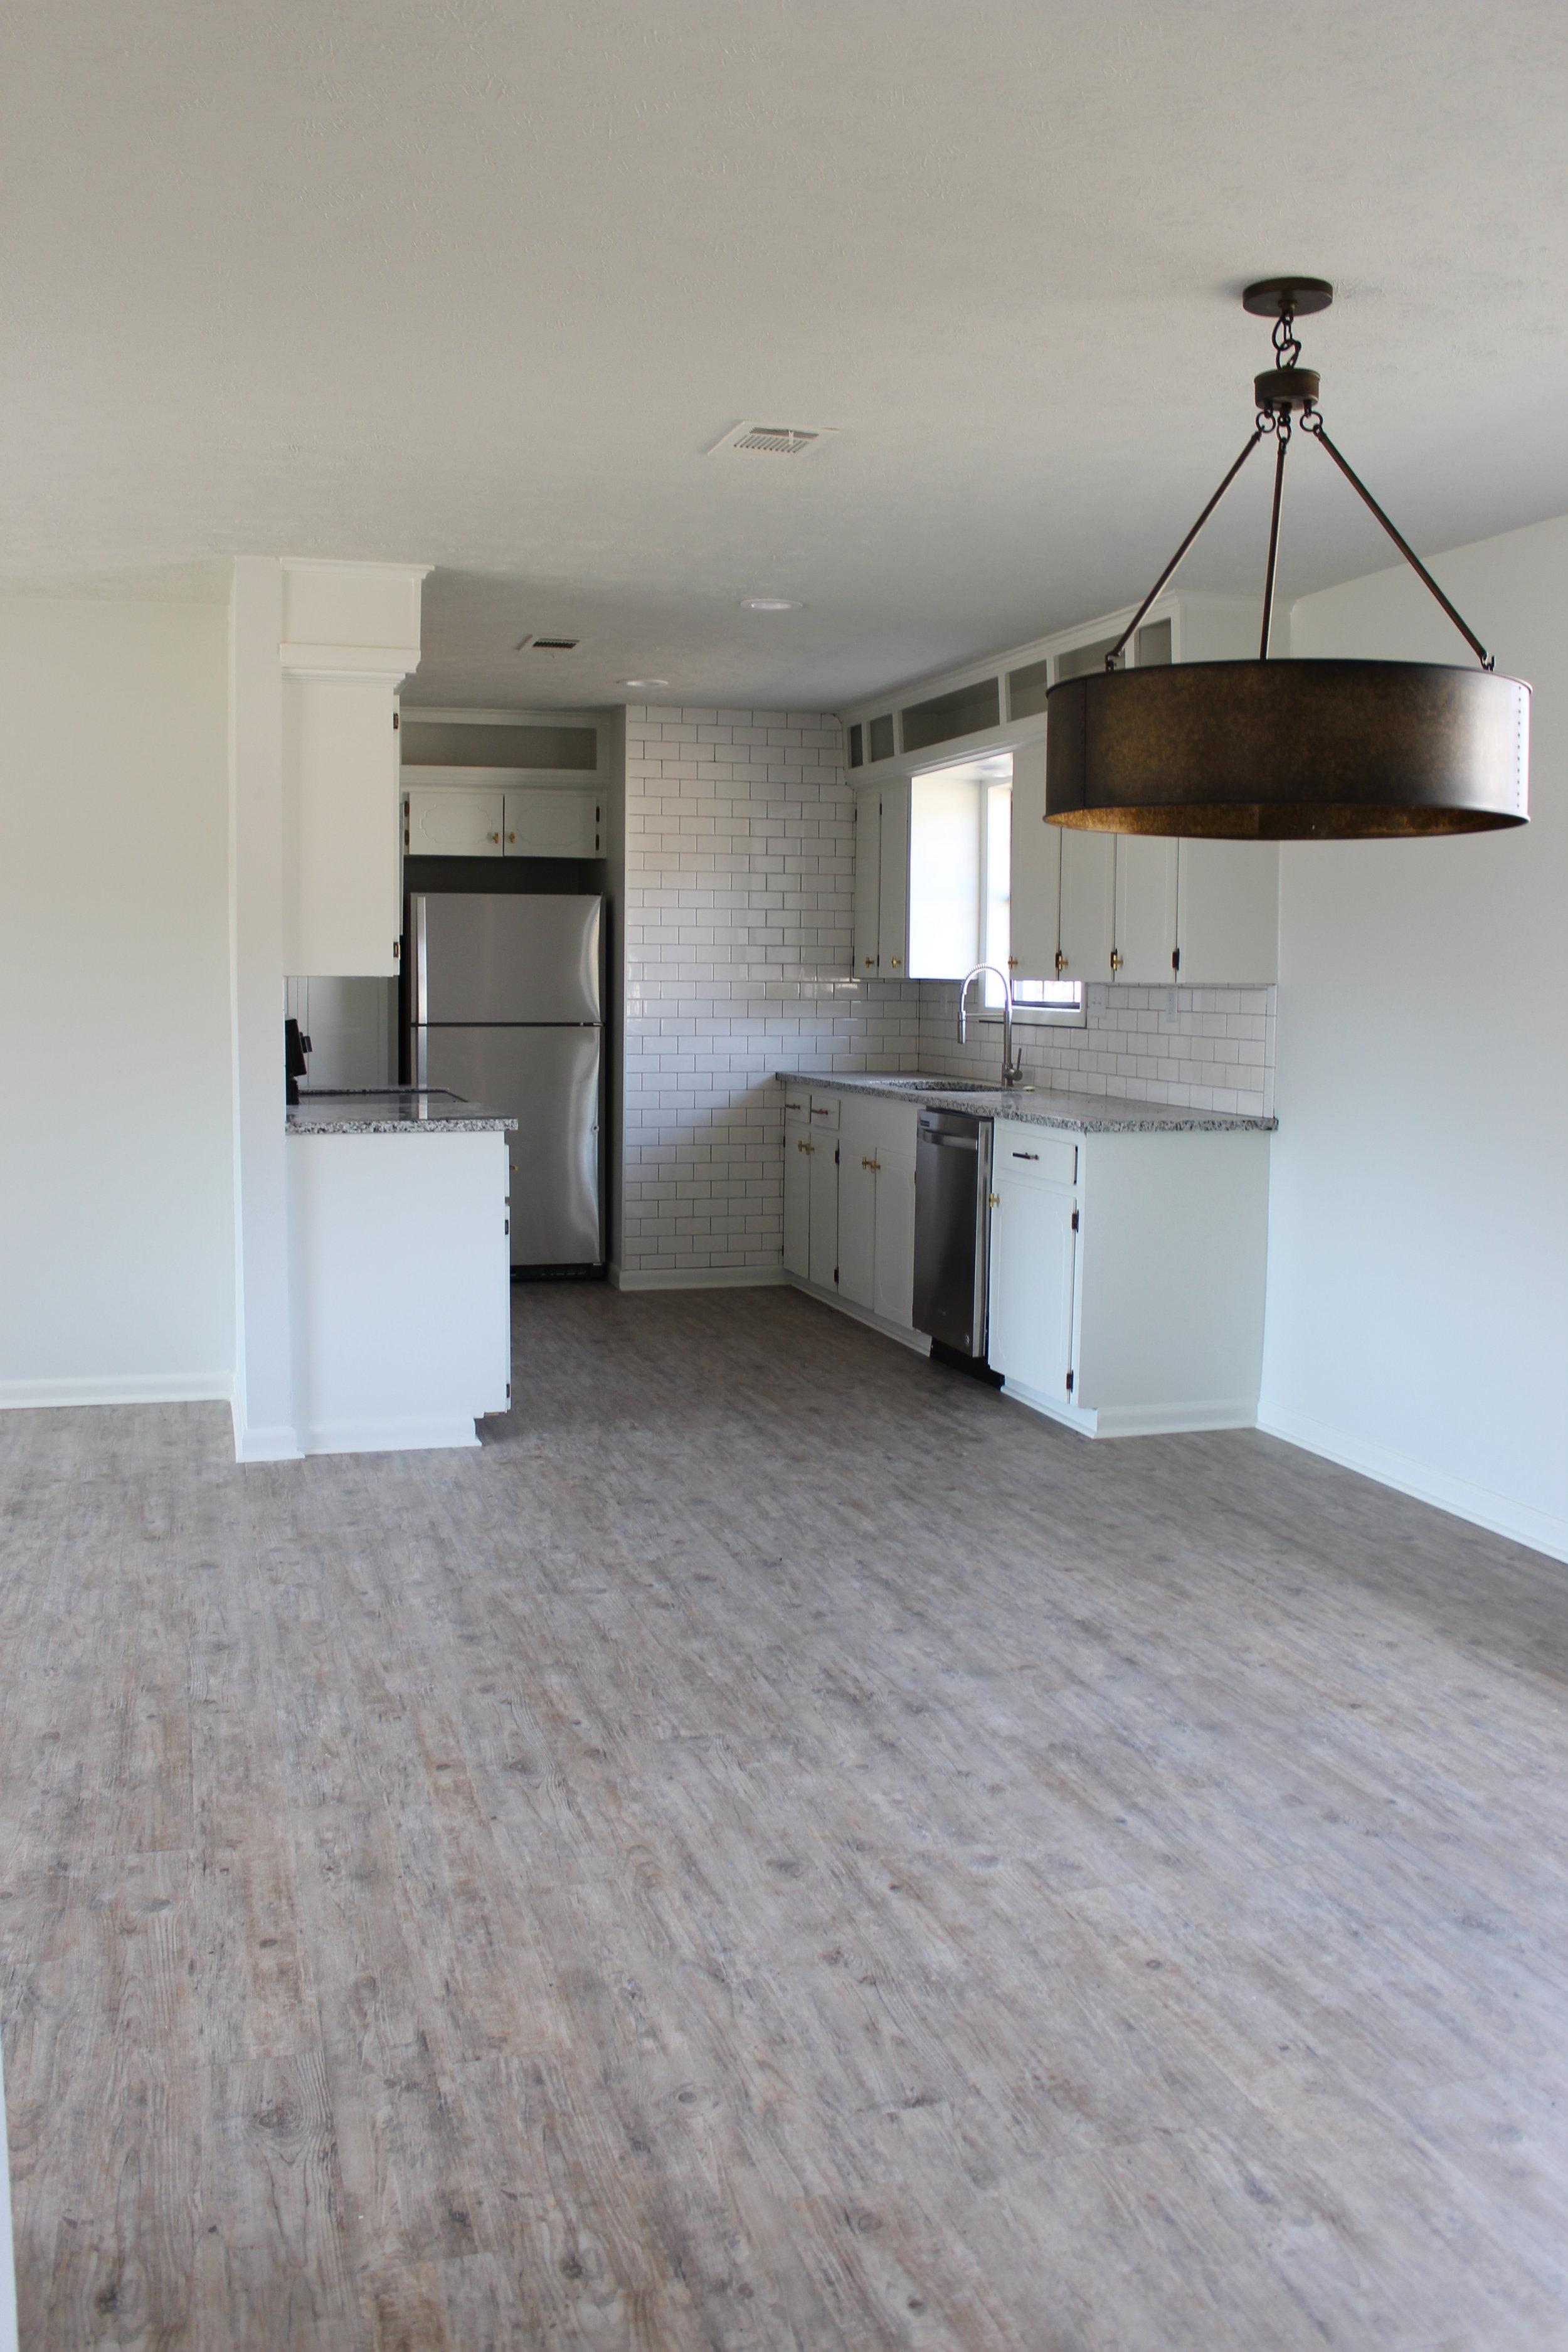 zimmerman_flip_house_after_picture_southern_arkansas_kitchen.JPG